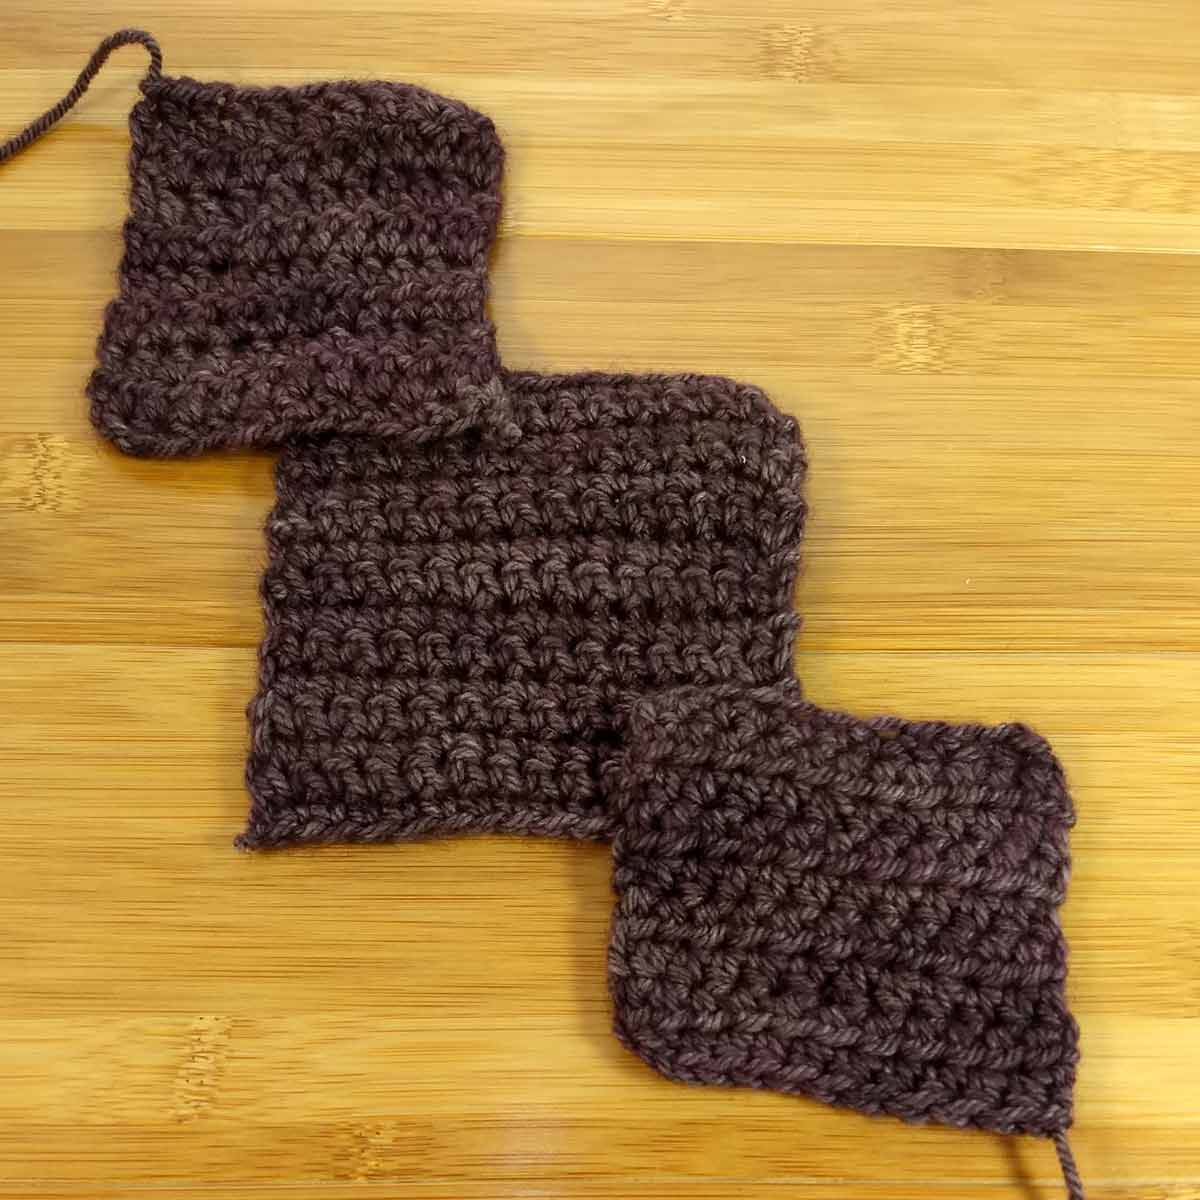 katara-crochet.jpg